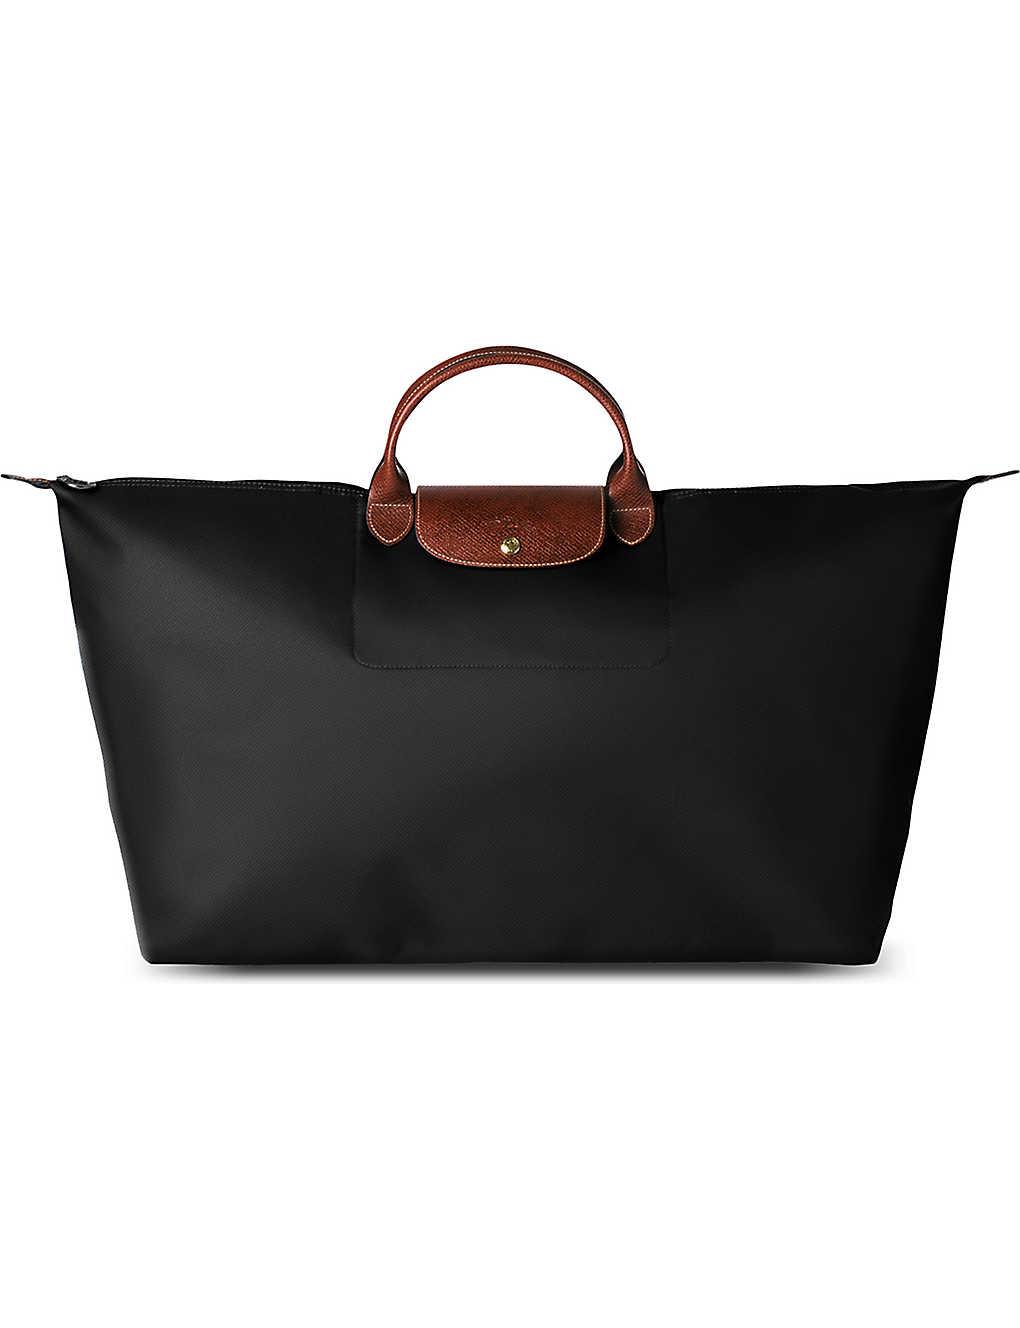 c23018da73c3 LONGCHAMP - Le Pliage large travel bag in black